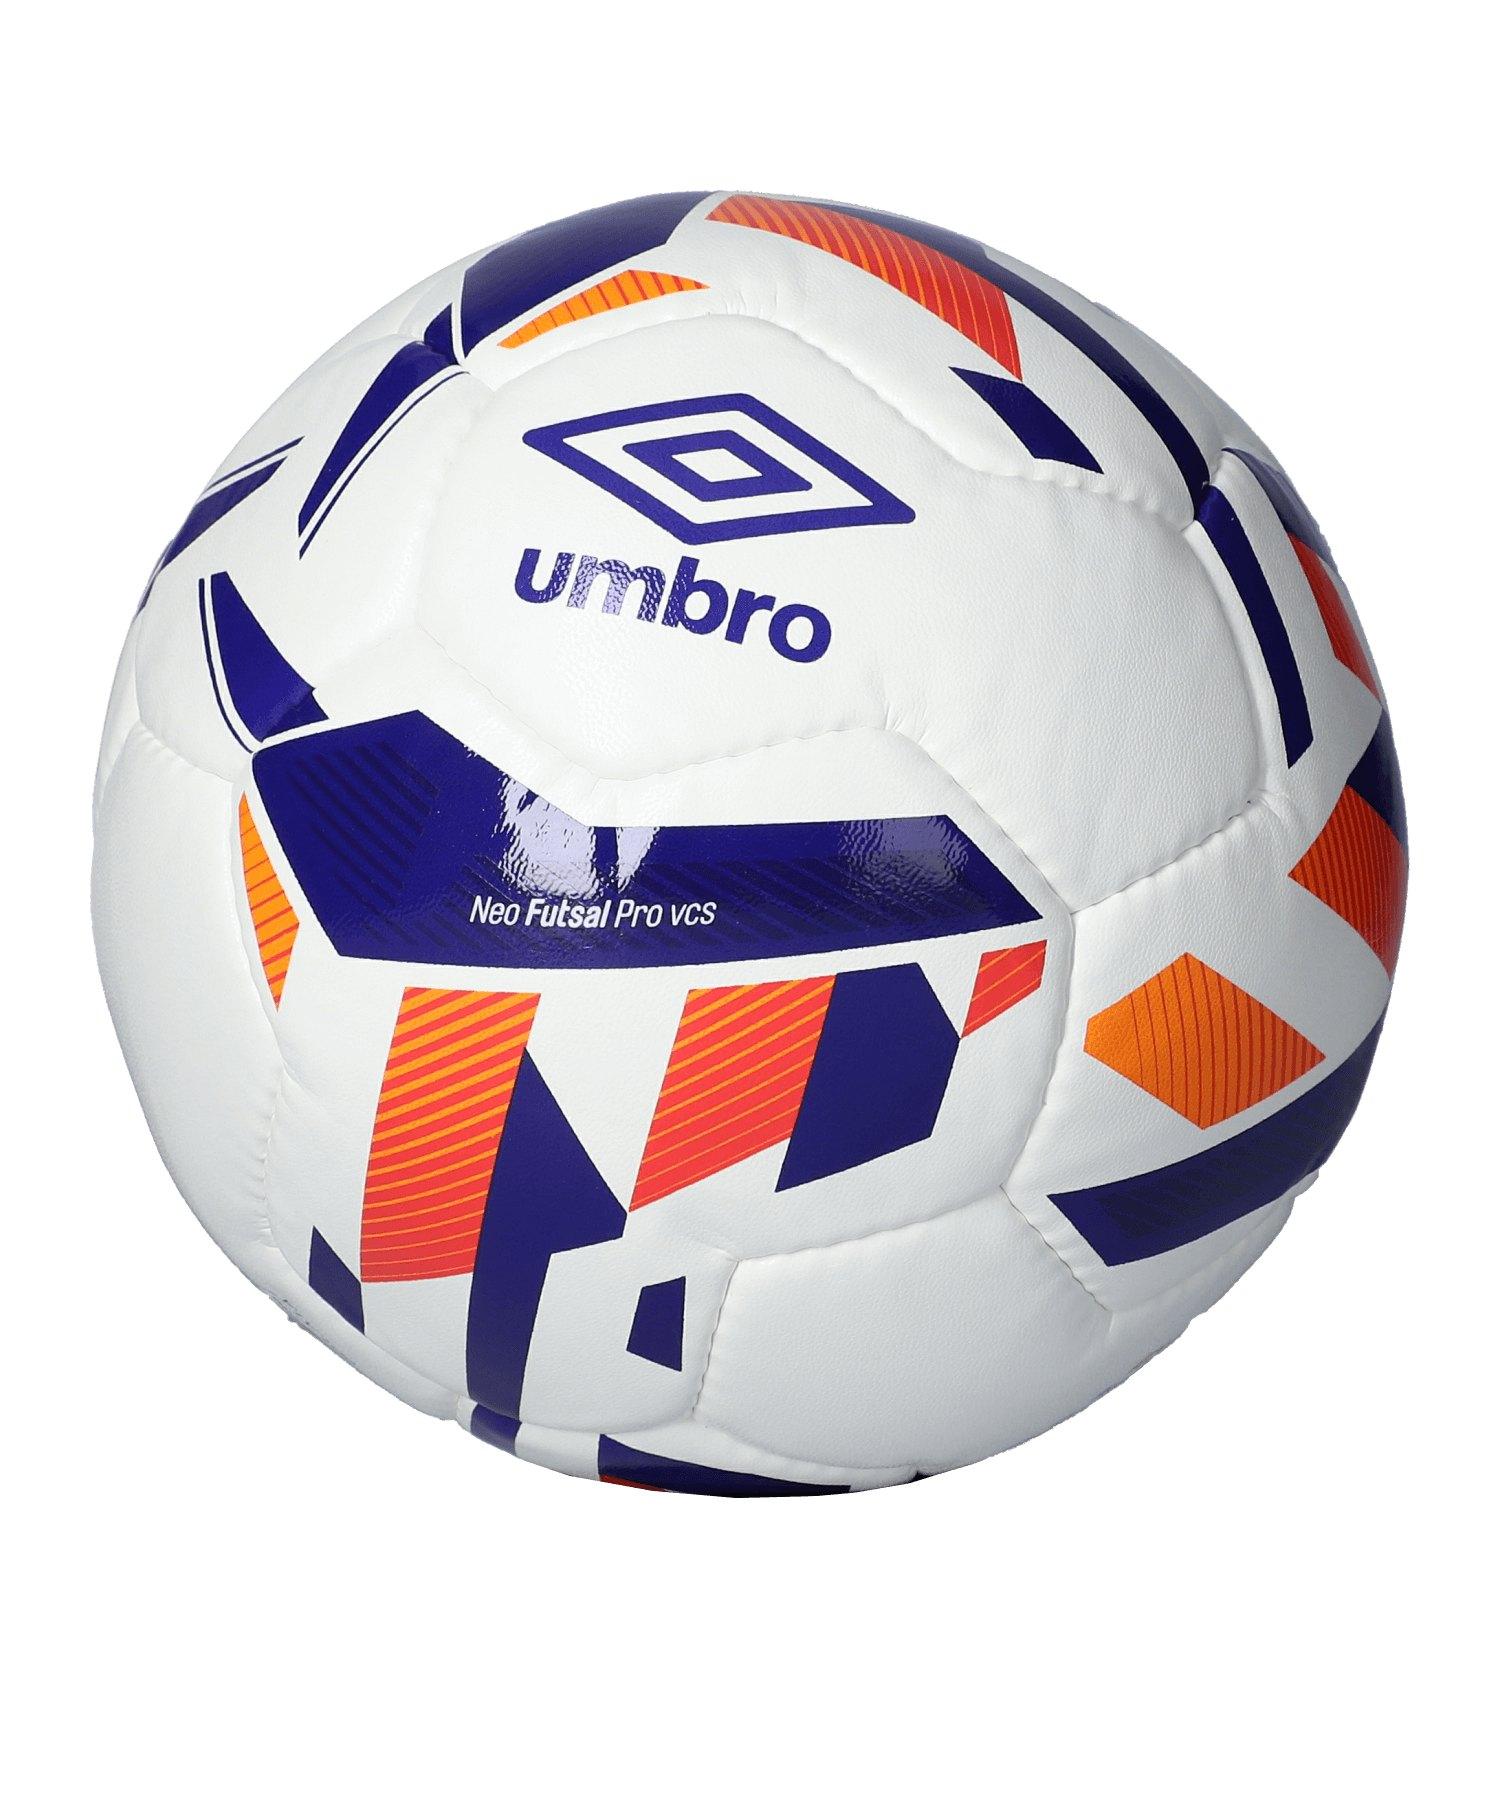 Umbro Neo Futsal Pro Trainingsball Weiss FZM - weiss